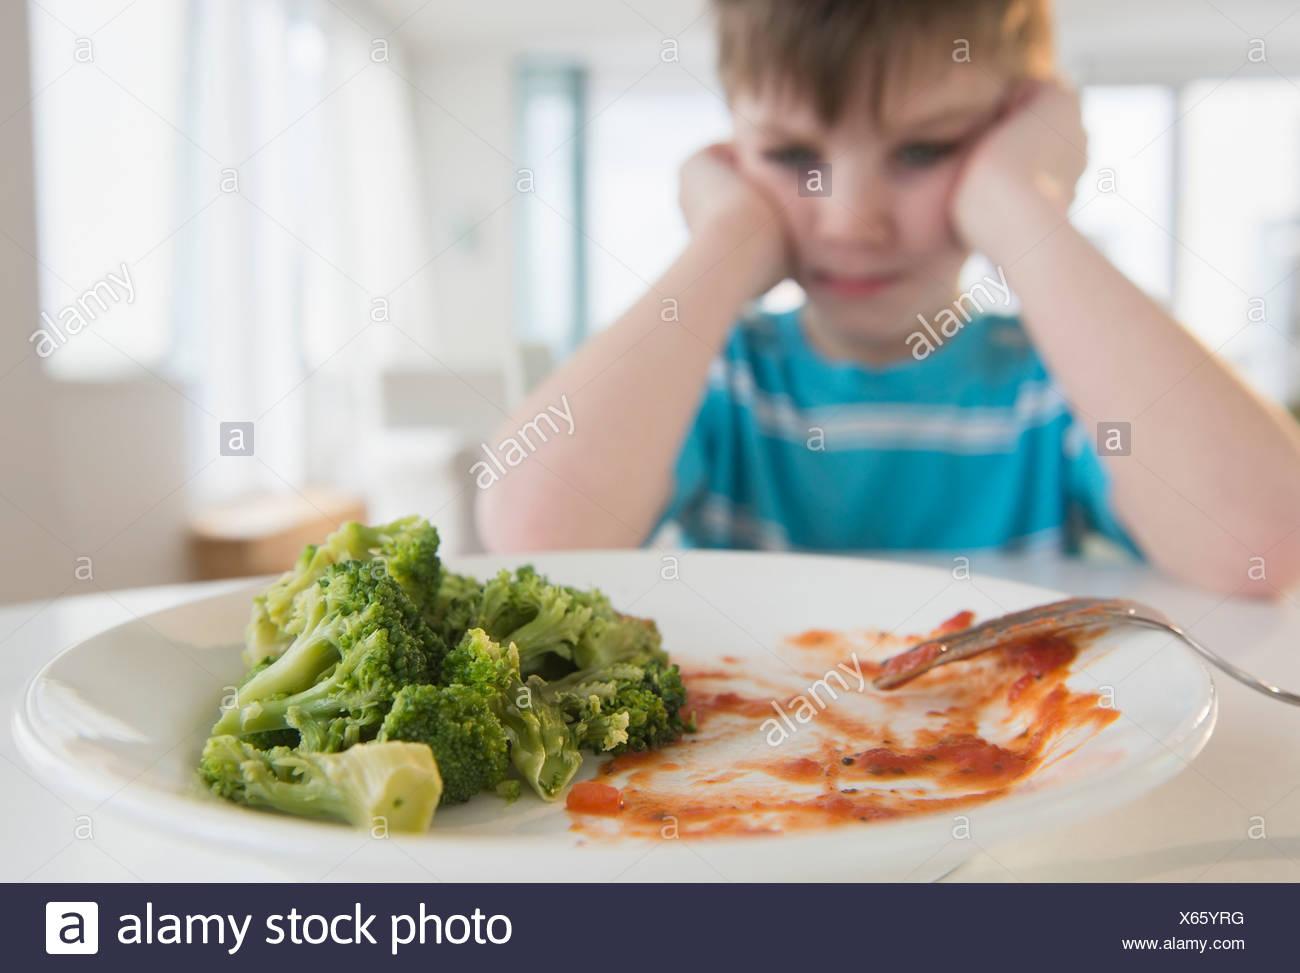 Portrait of boy (4-5) annoyed to eat broccoli - Stock Image